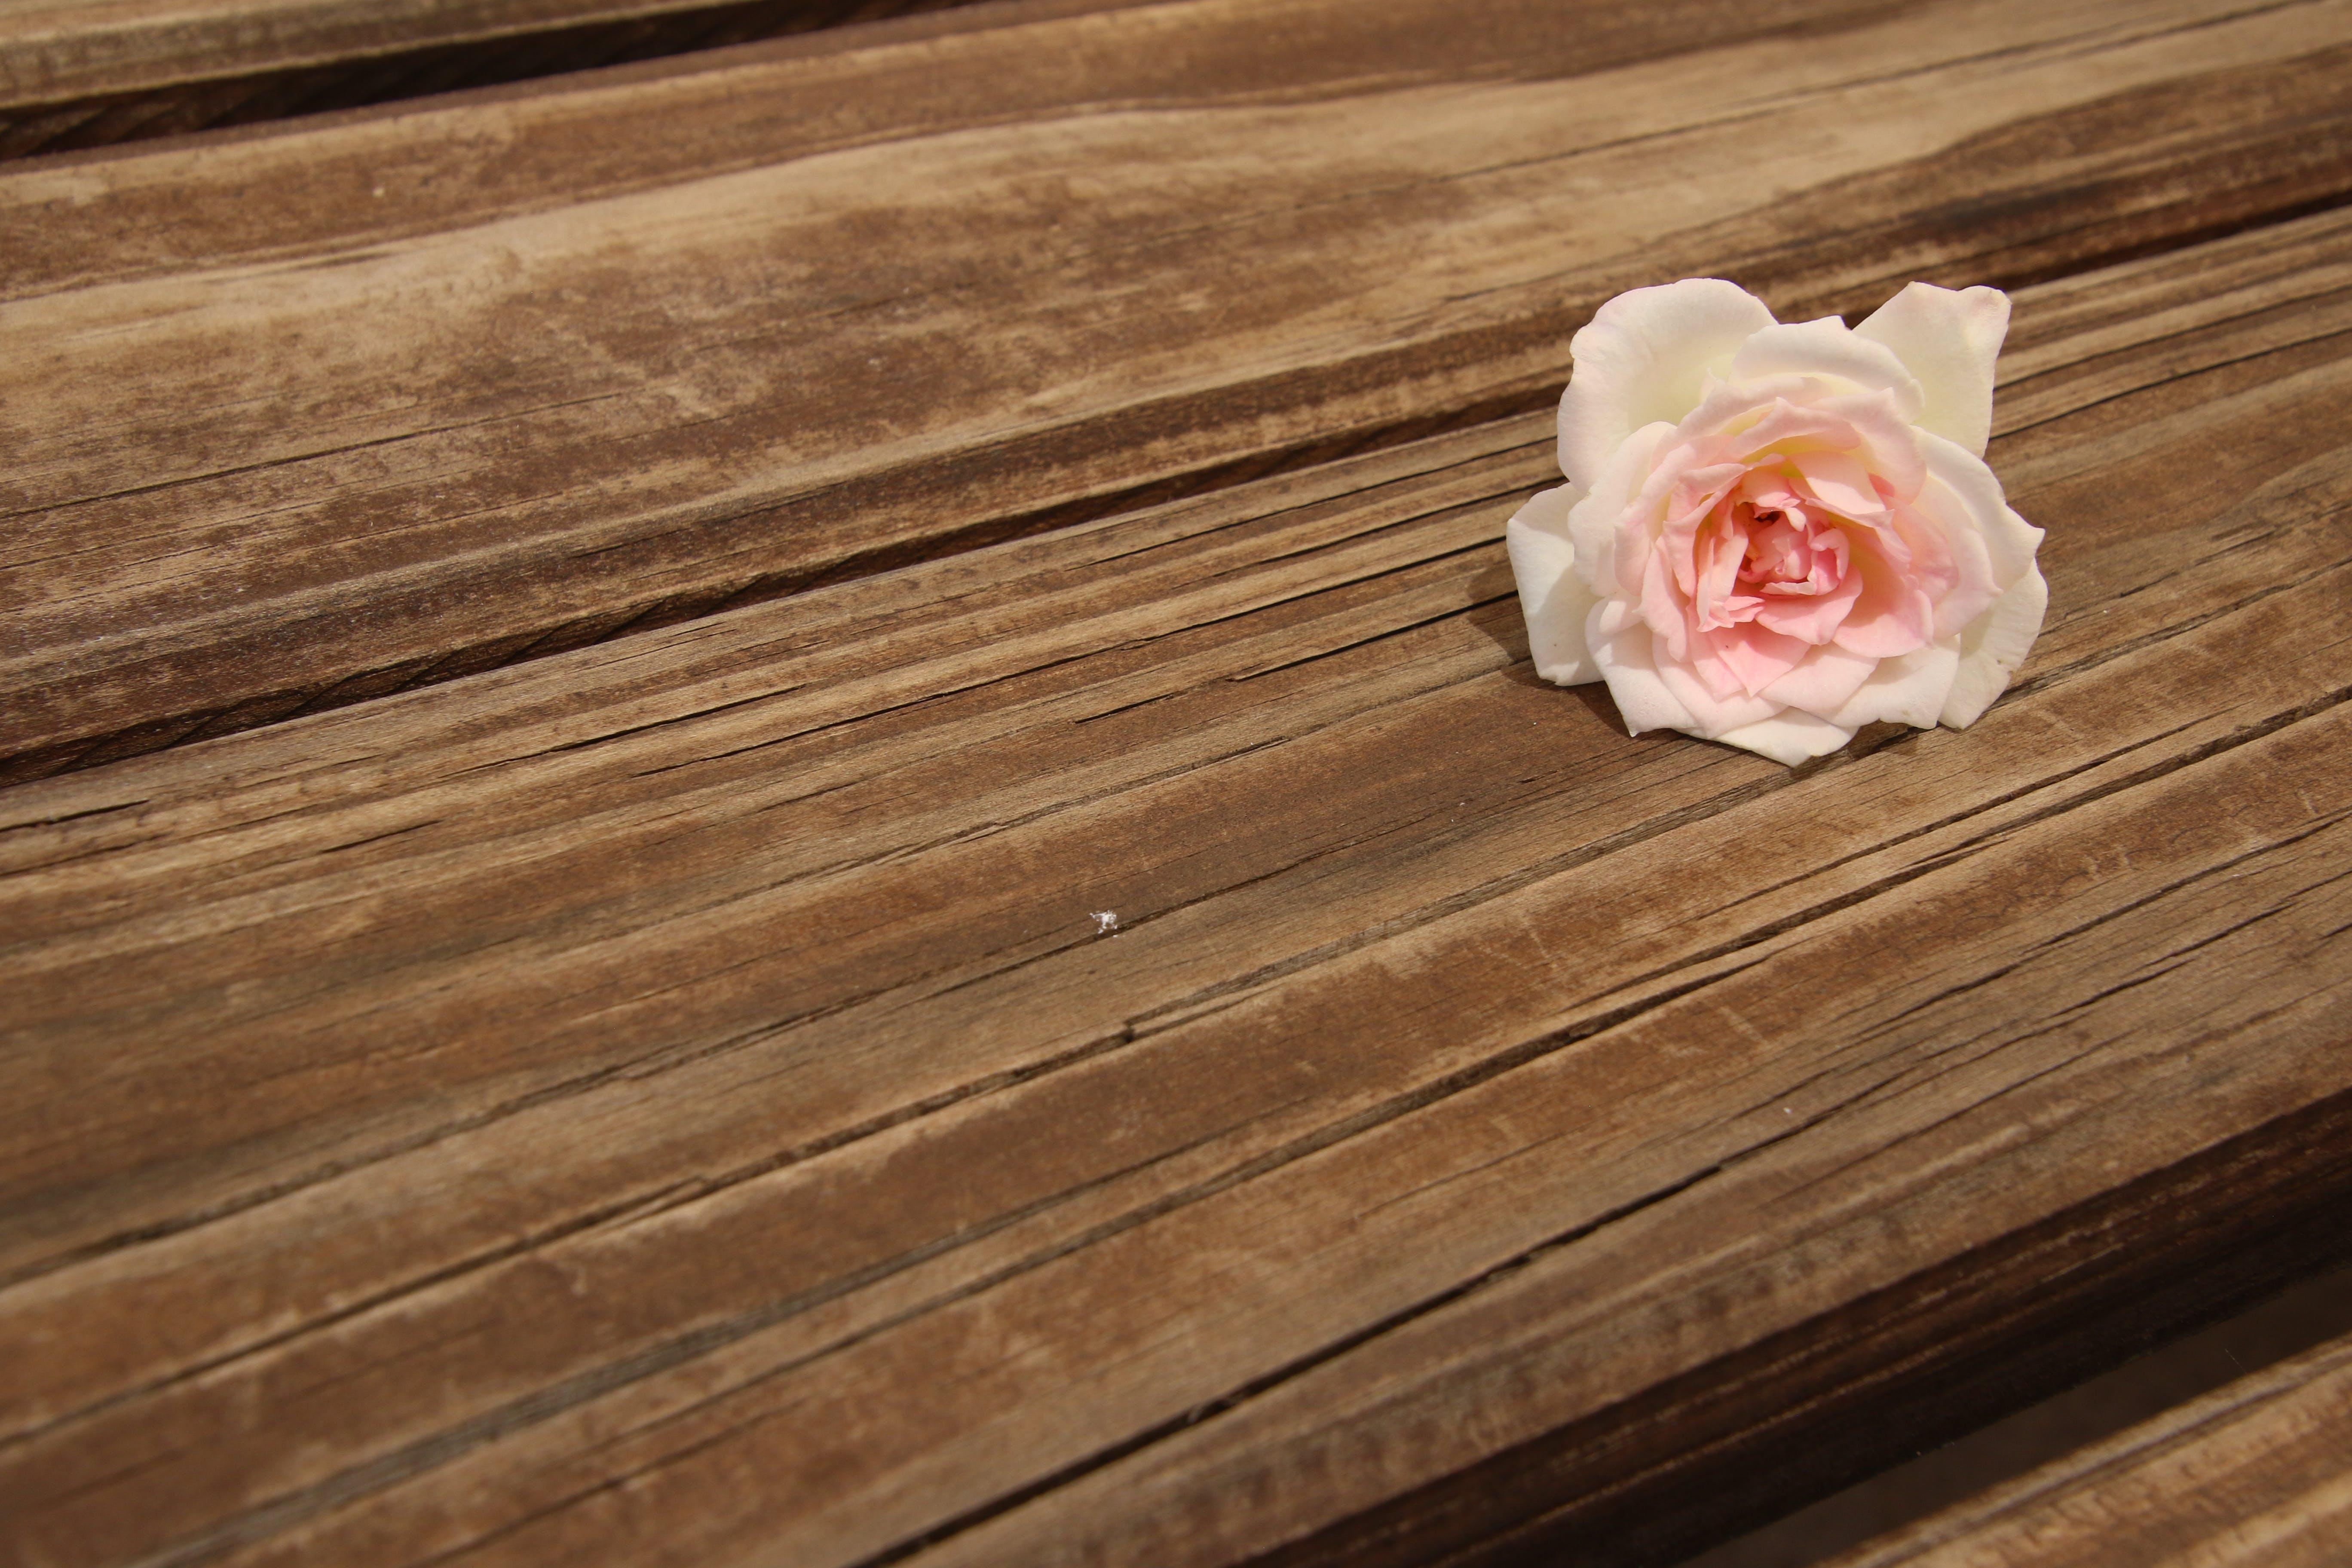 Free stock photo of wood, nature, texture, garden